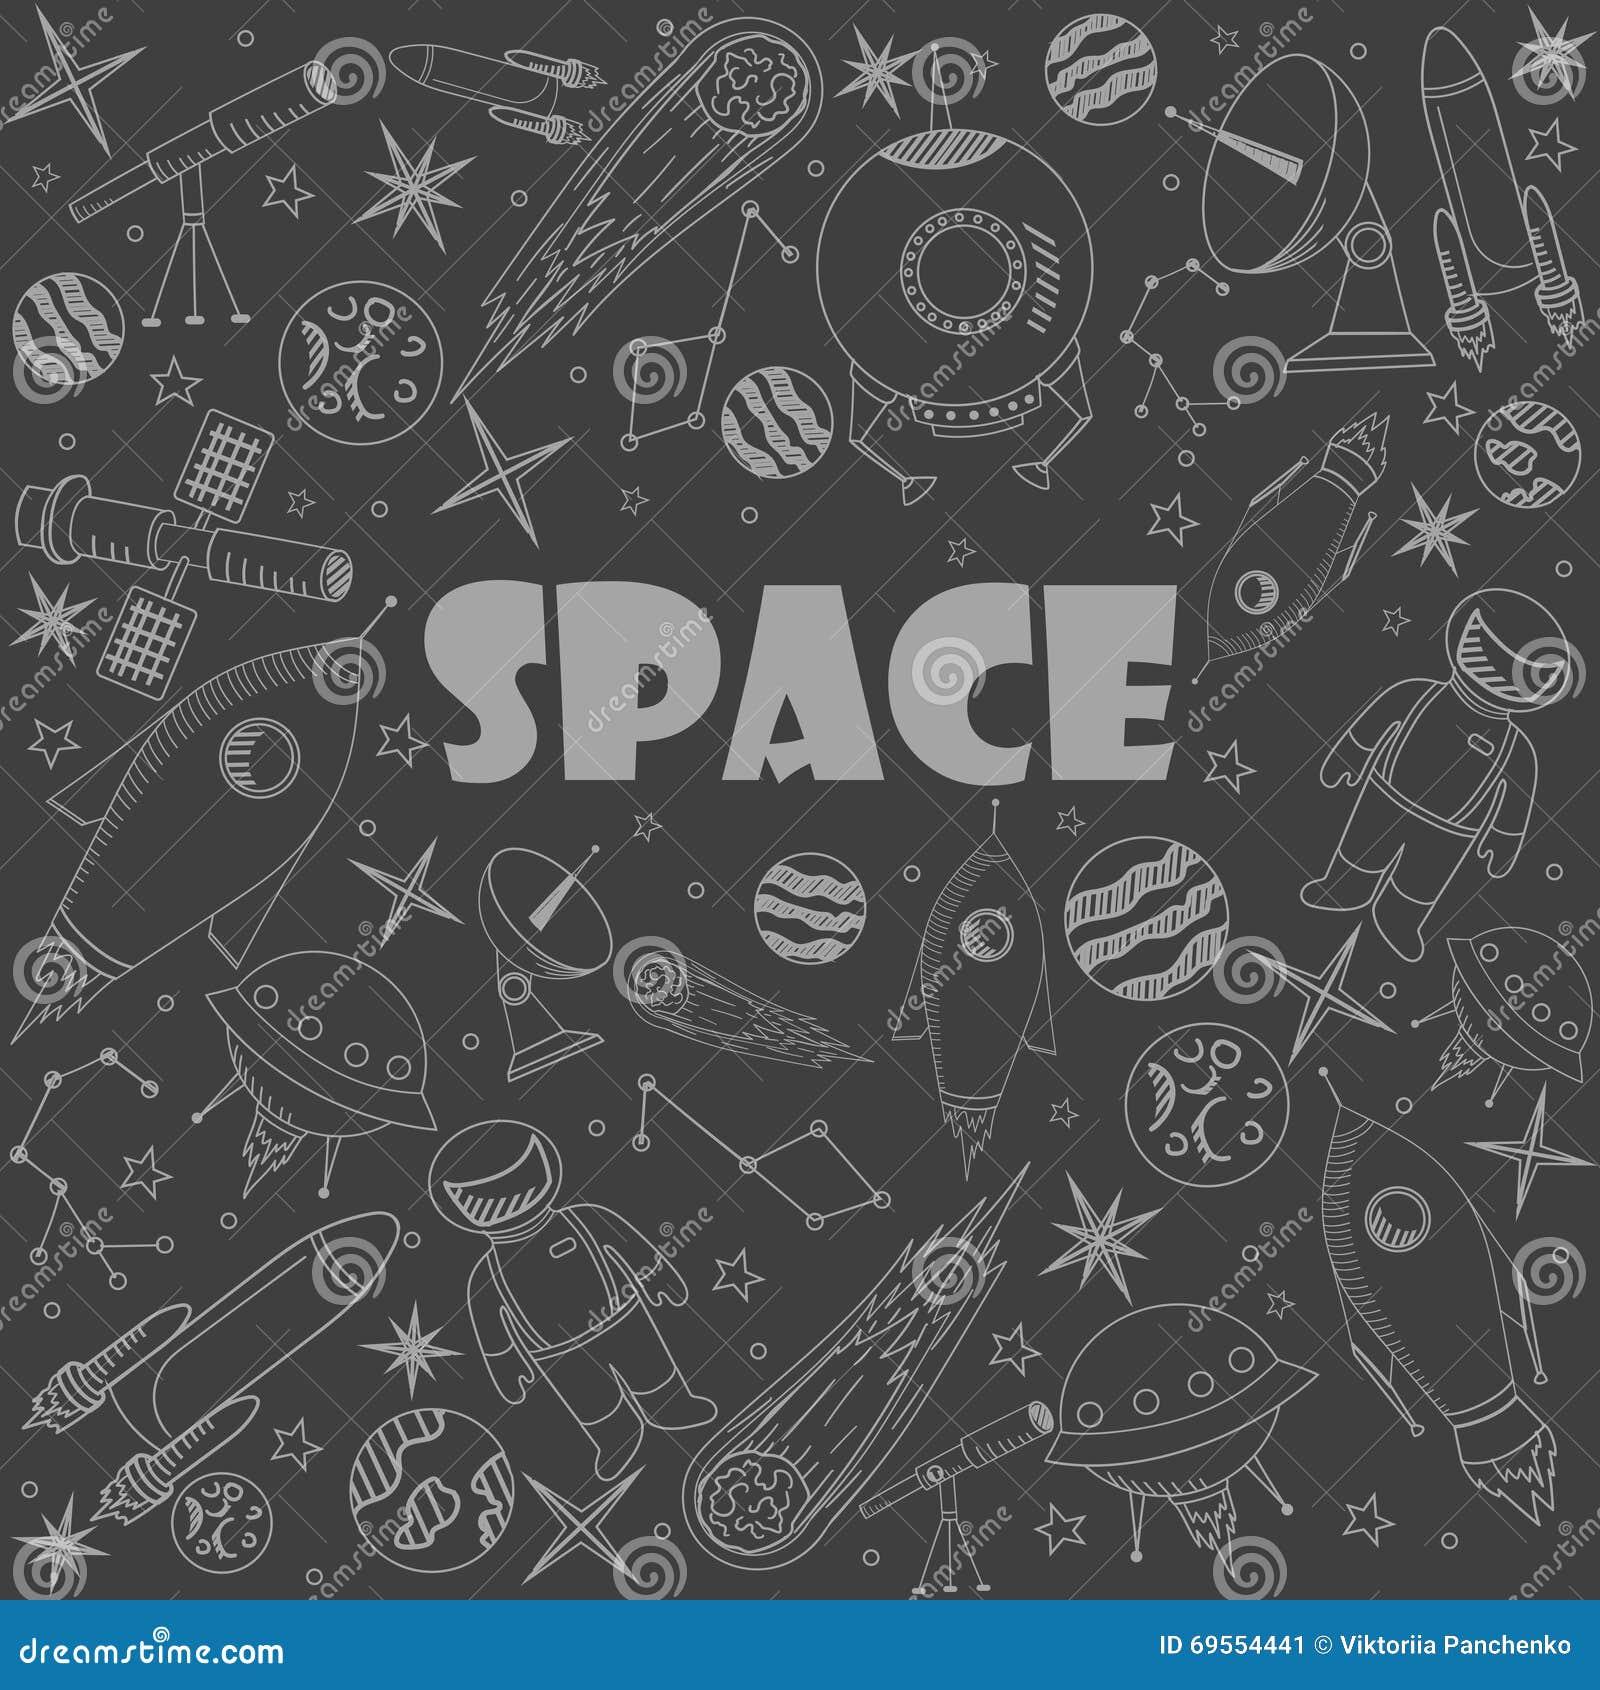 Space line art design vector illustration cartoon vector for Space art design